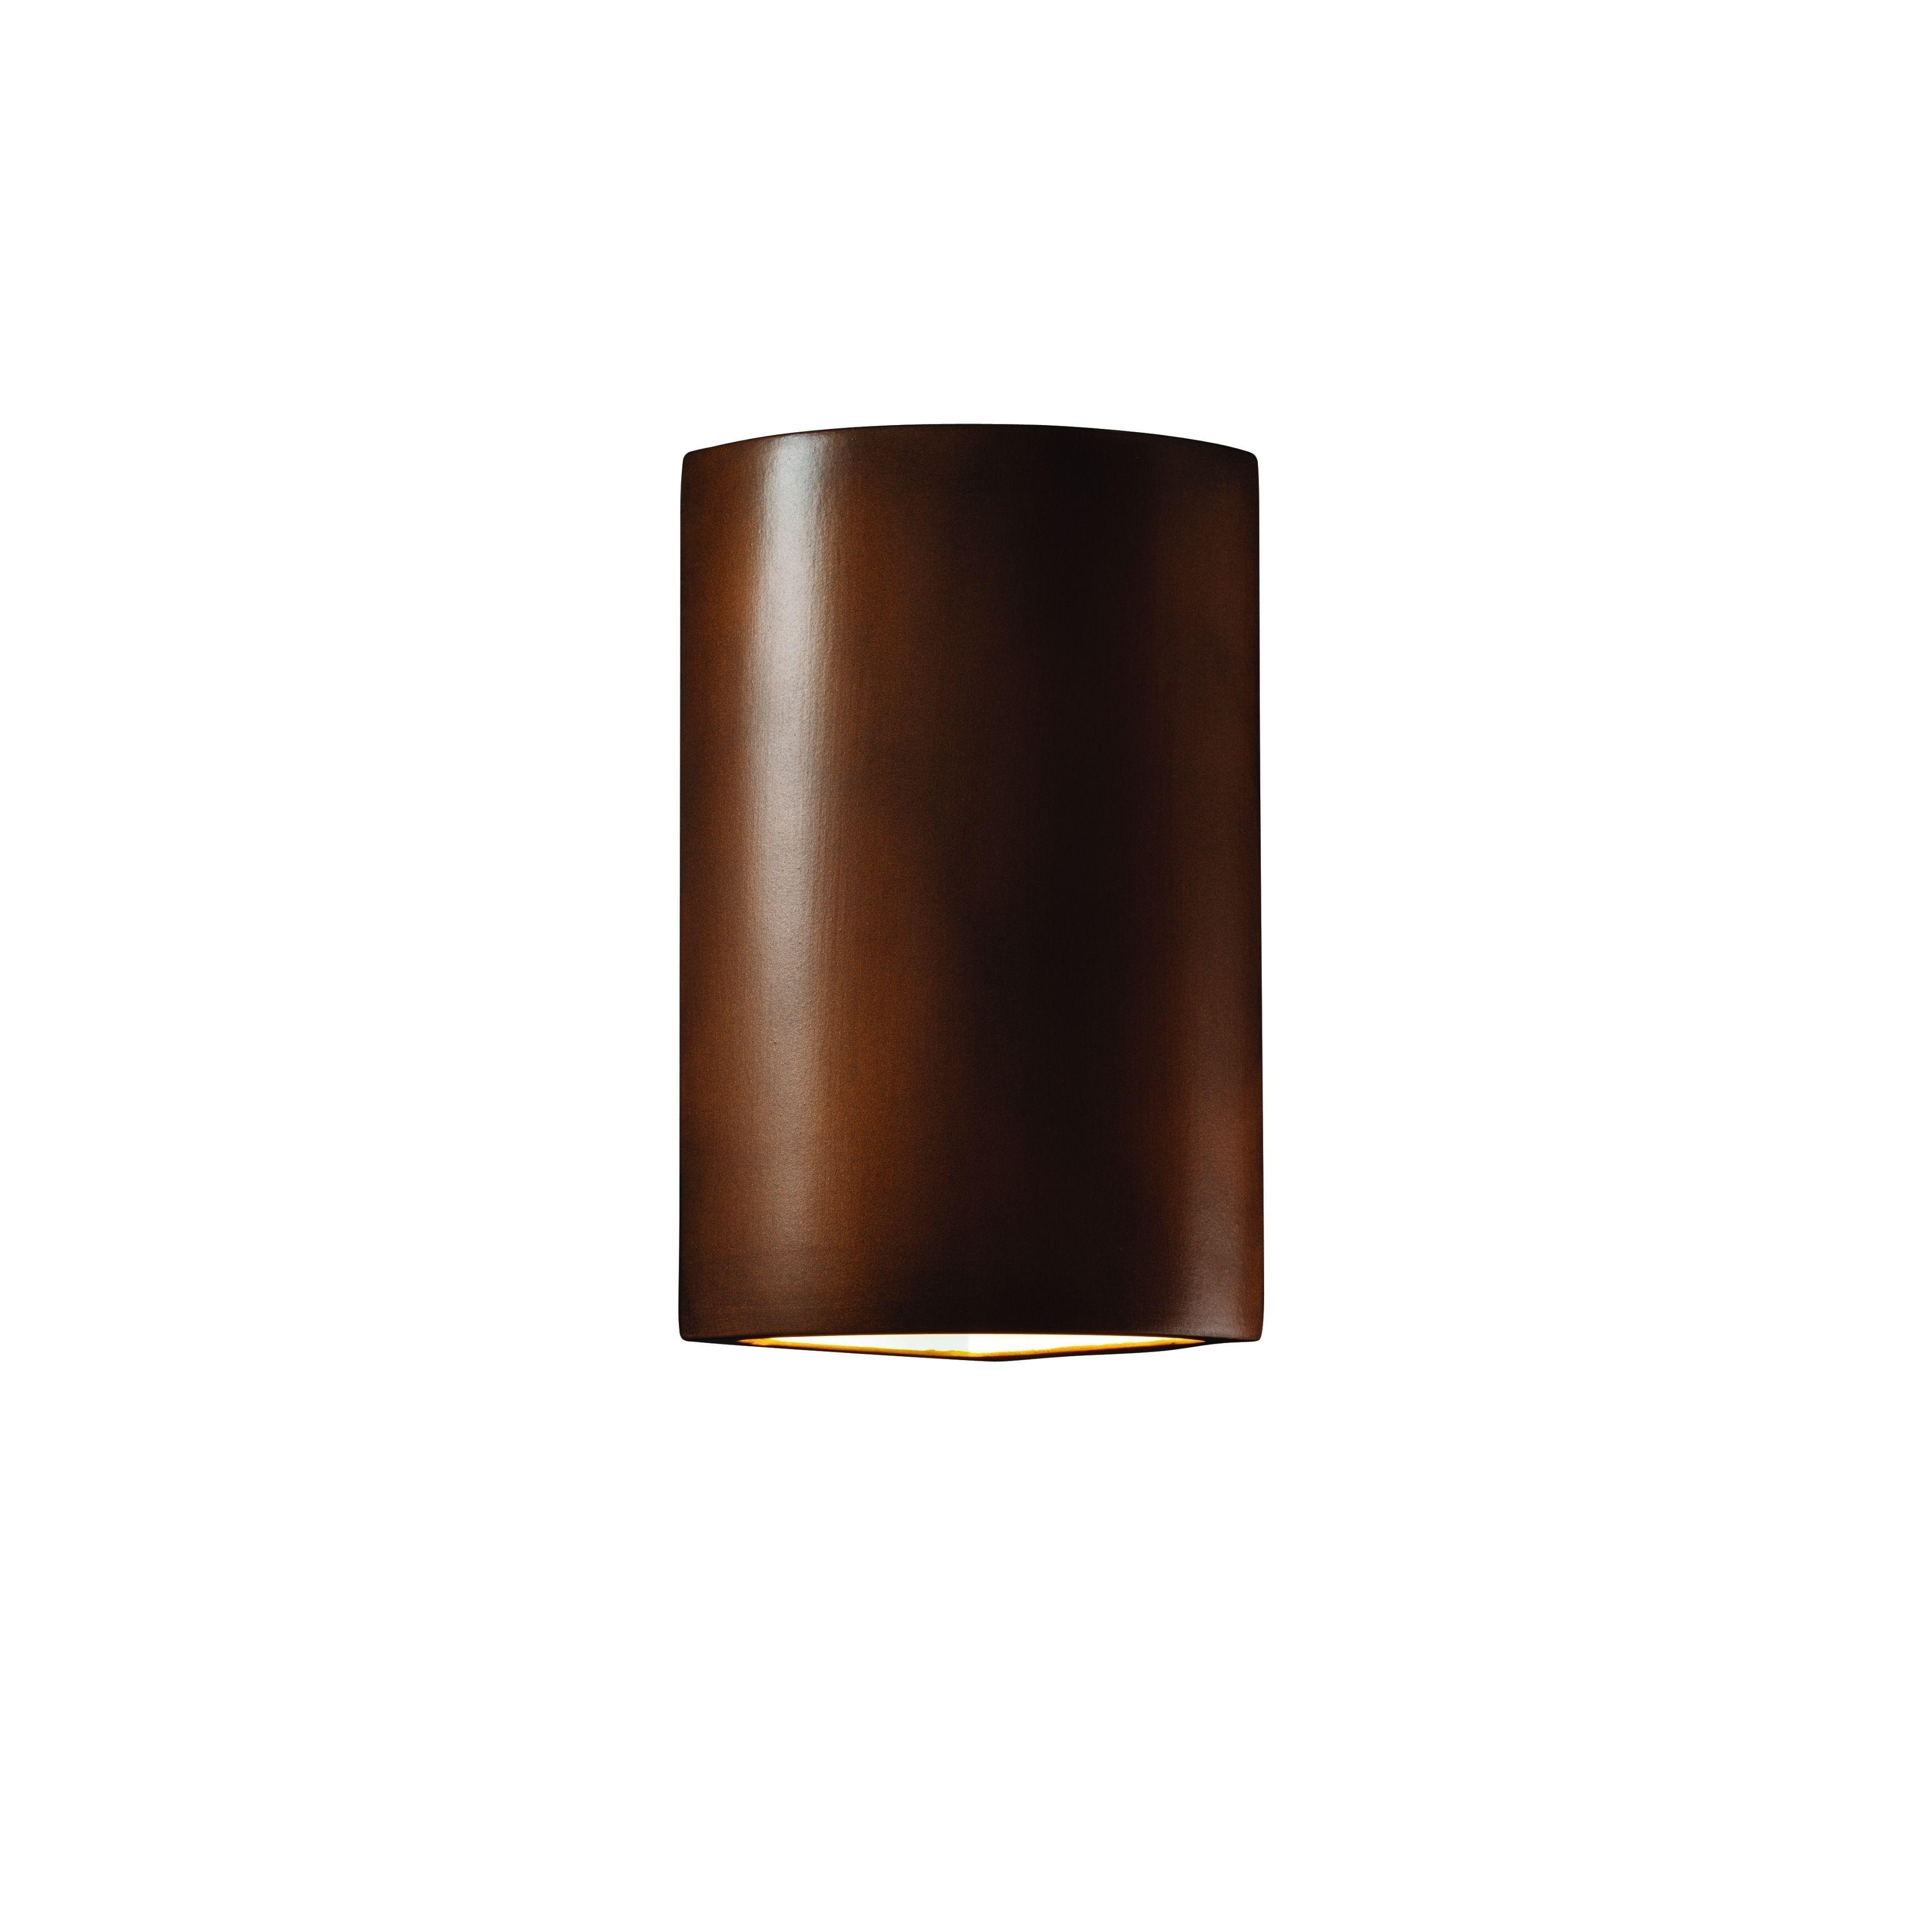 justice design group ambiance antique copper cylinder corner wall  - justice design group ambiance antique copper cylinder corner wall sconce